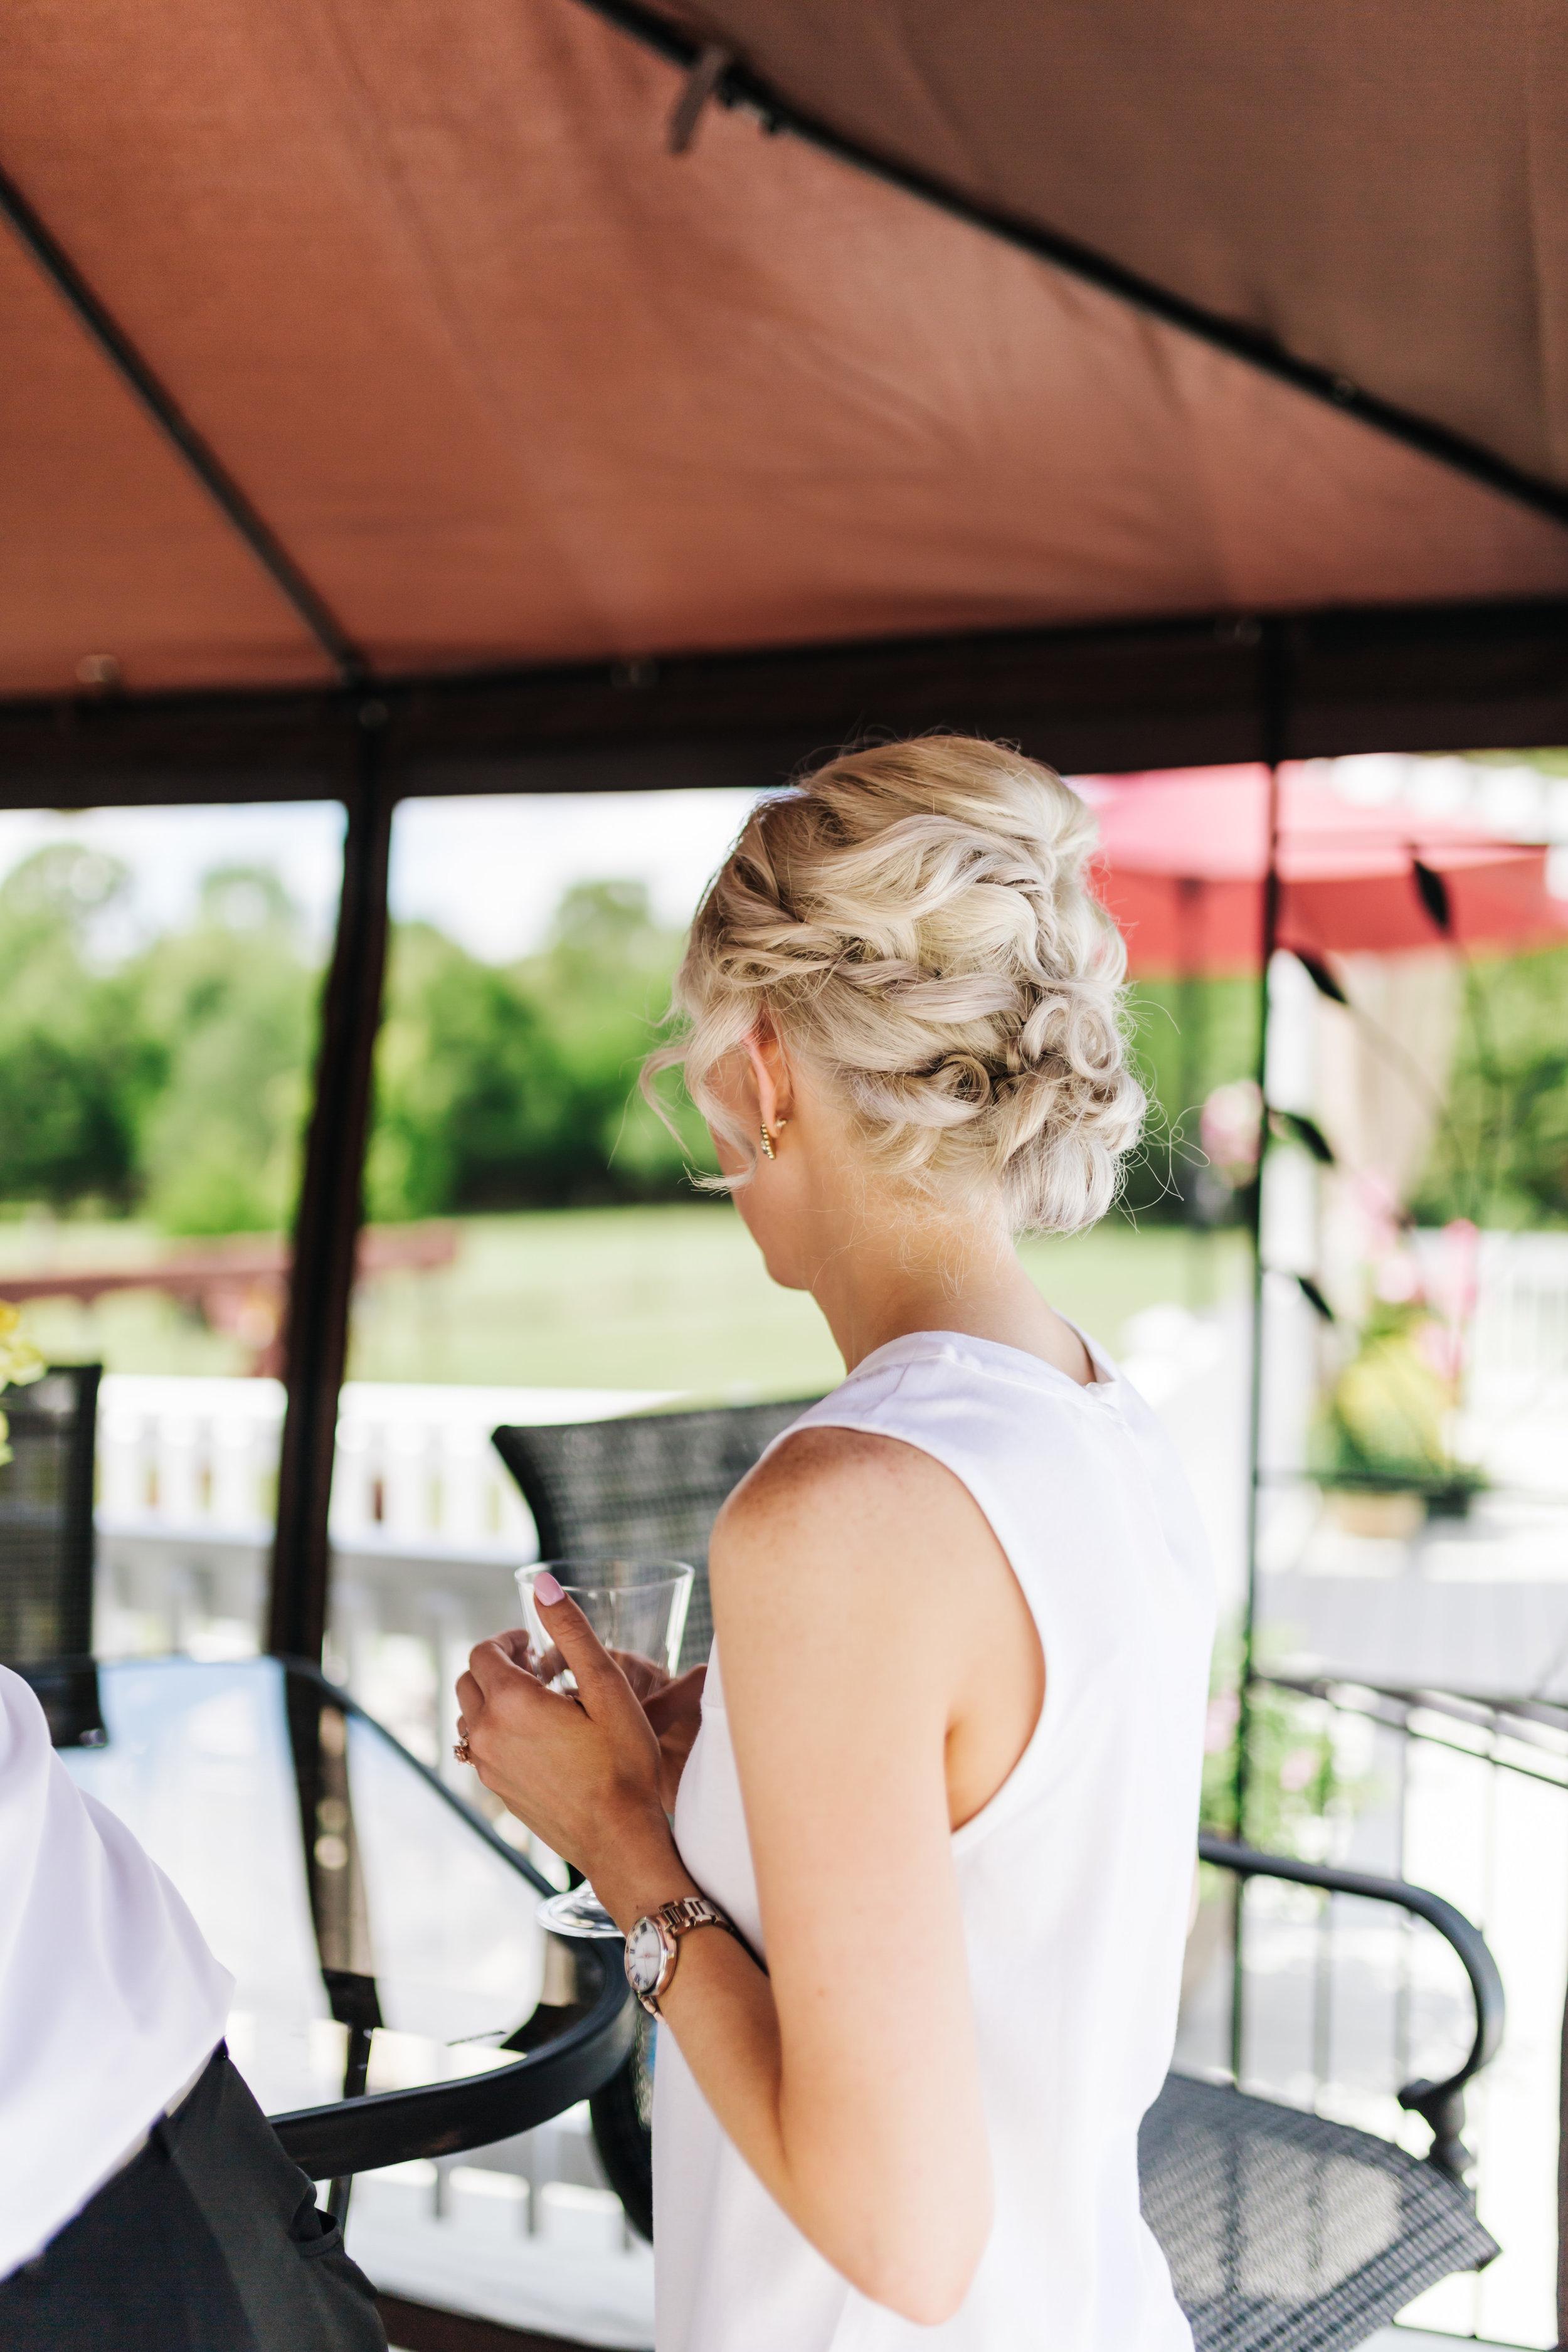 2018.09.02 Ray and Sarah Prizner Nashville TN Wedding FINALS-401.jpg